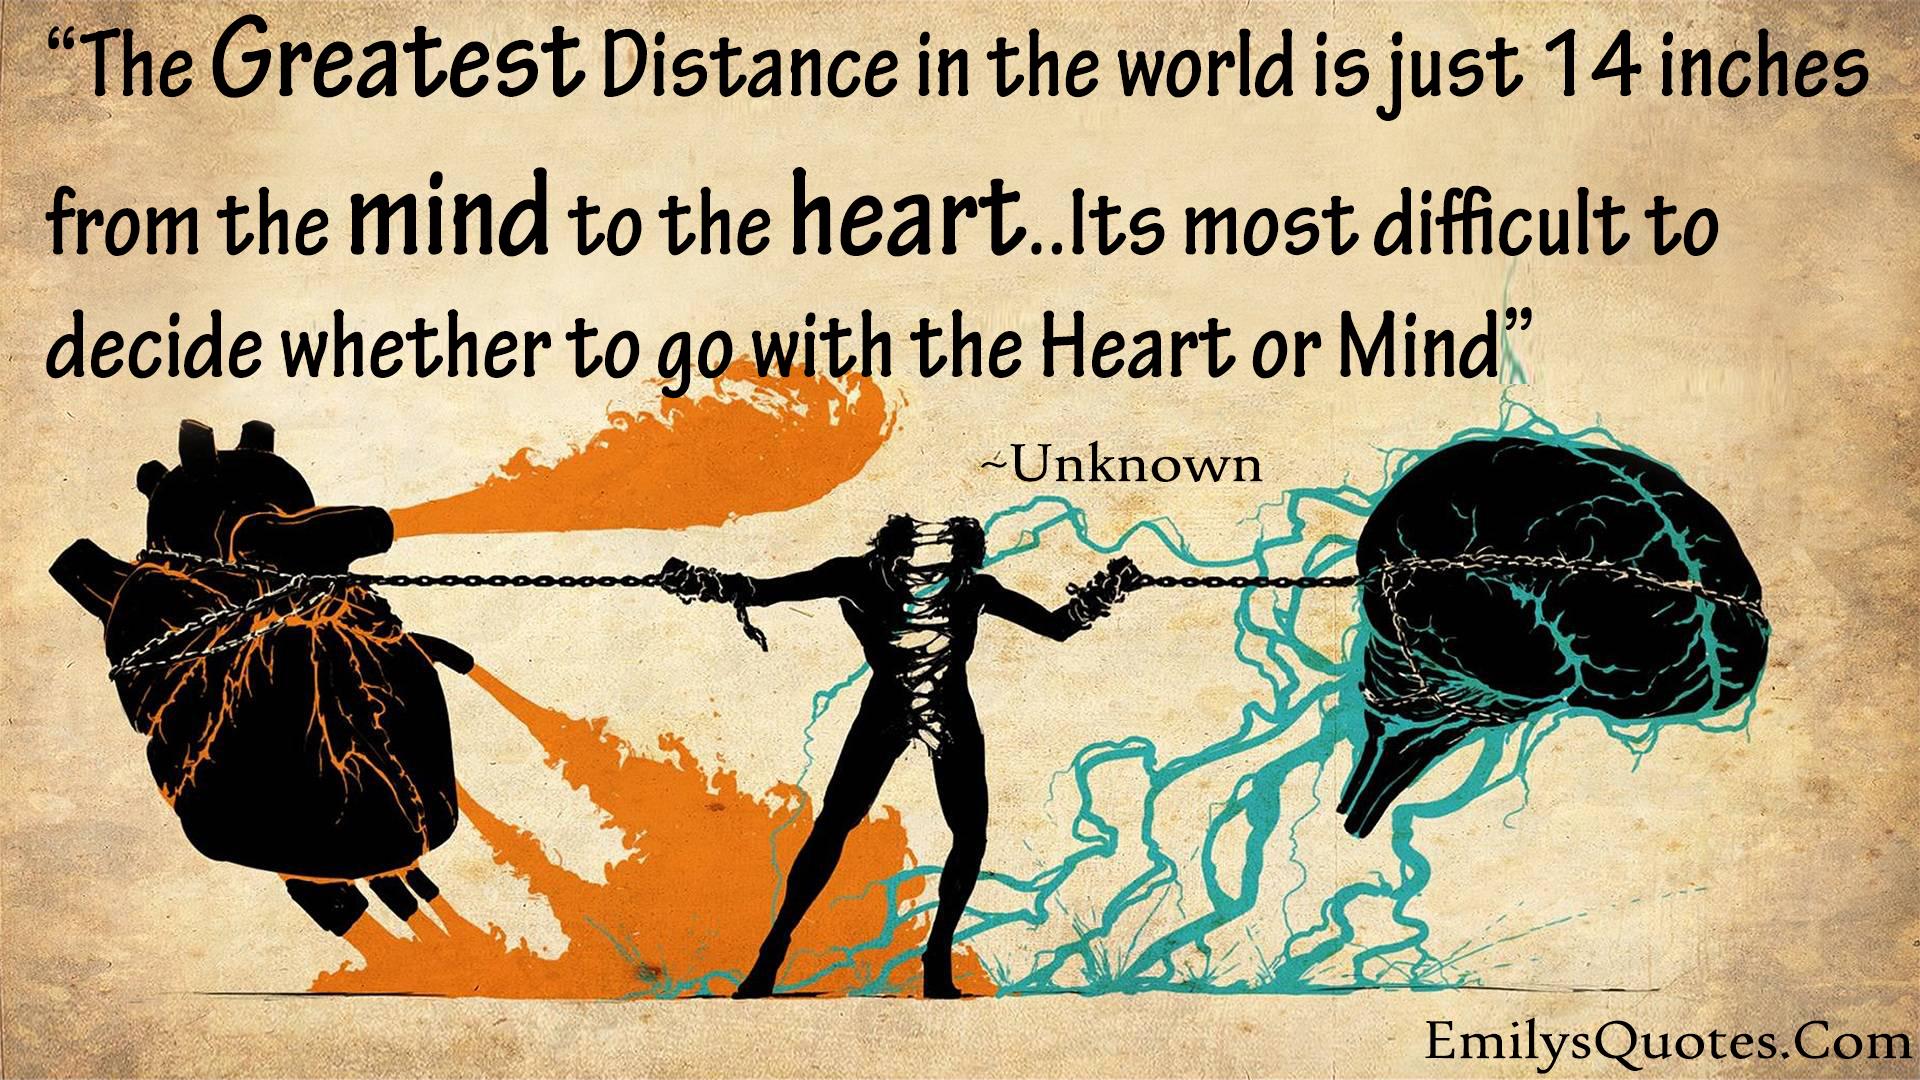 EmilysQuotes.Com - distance, mind, heart, choice, unknown, decision